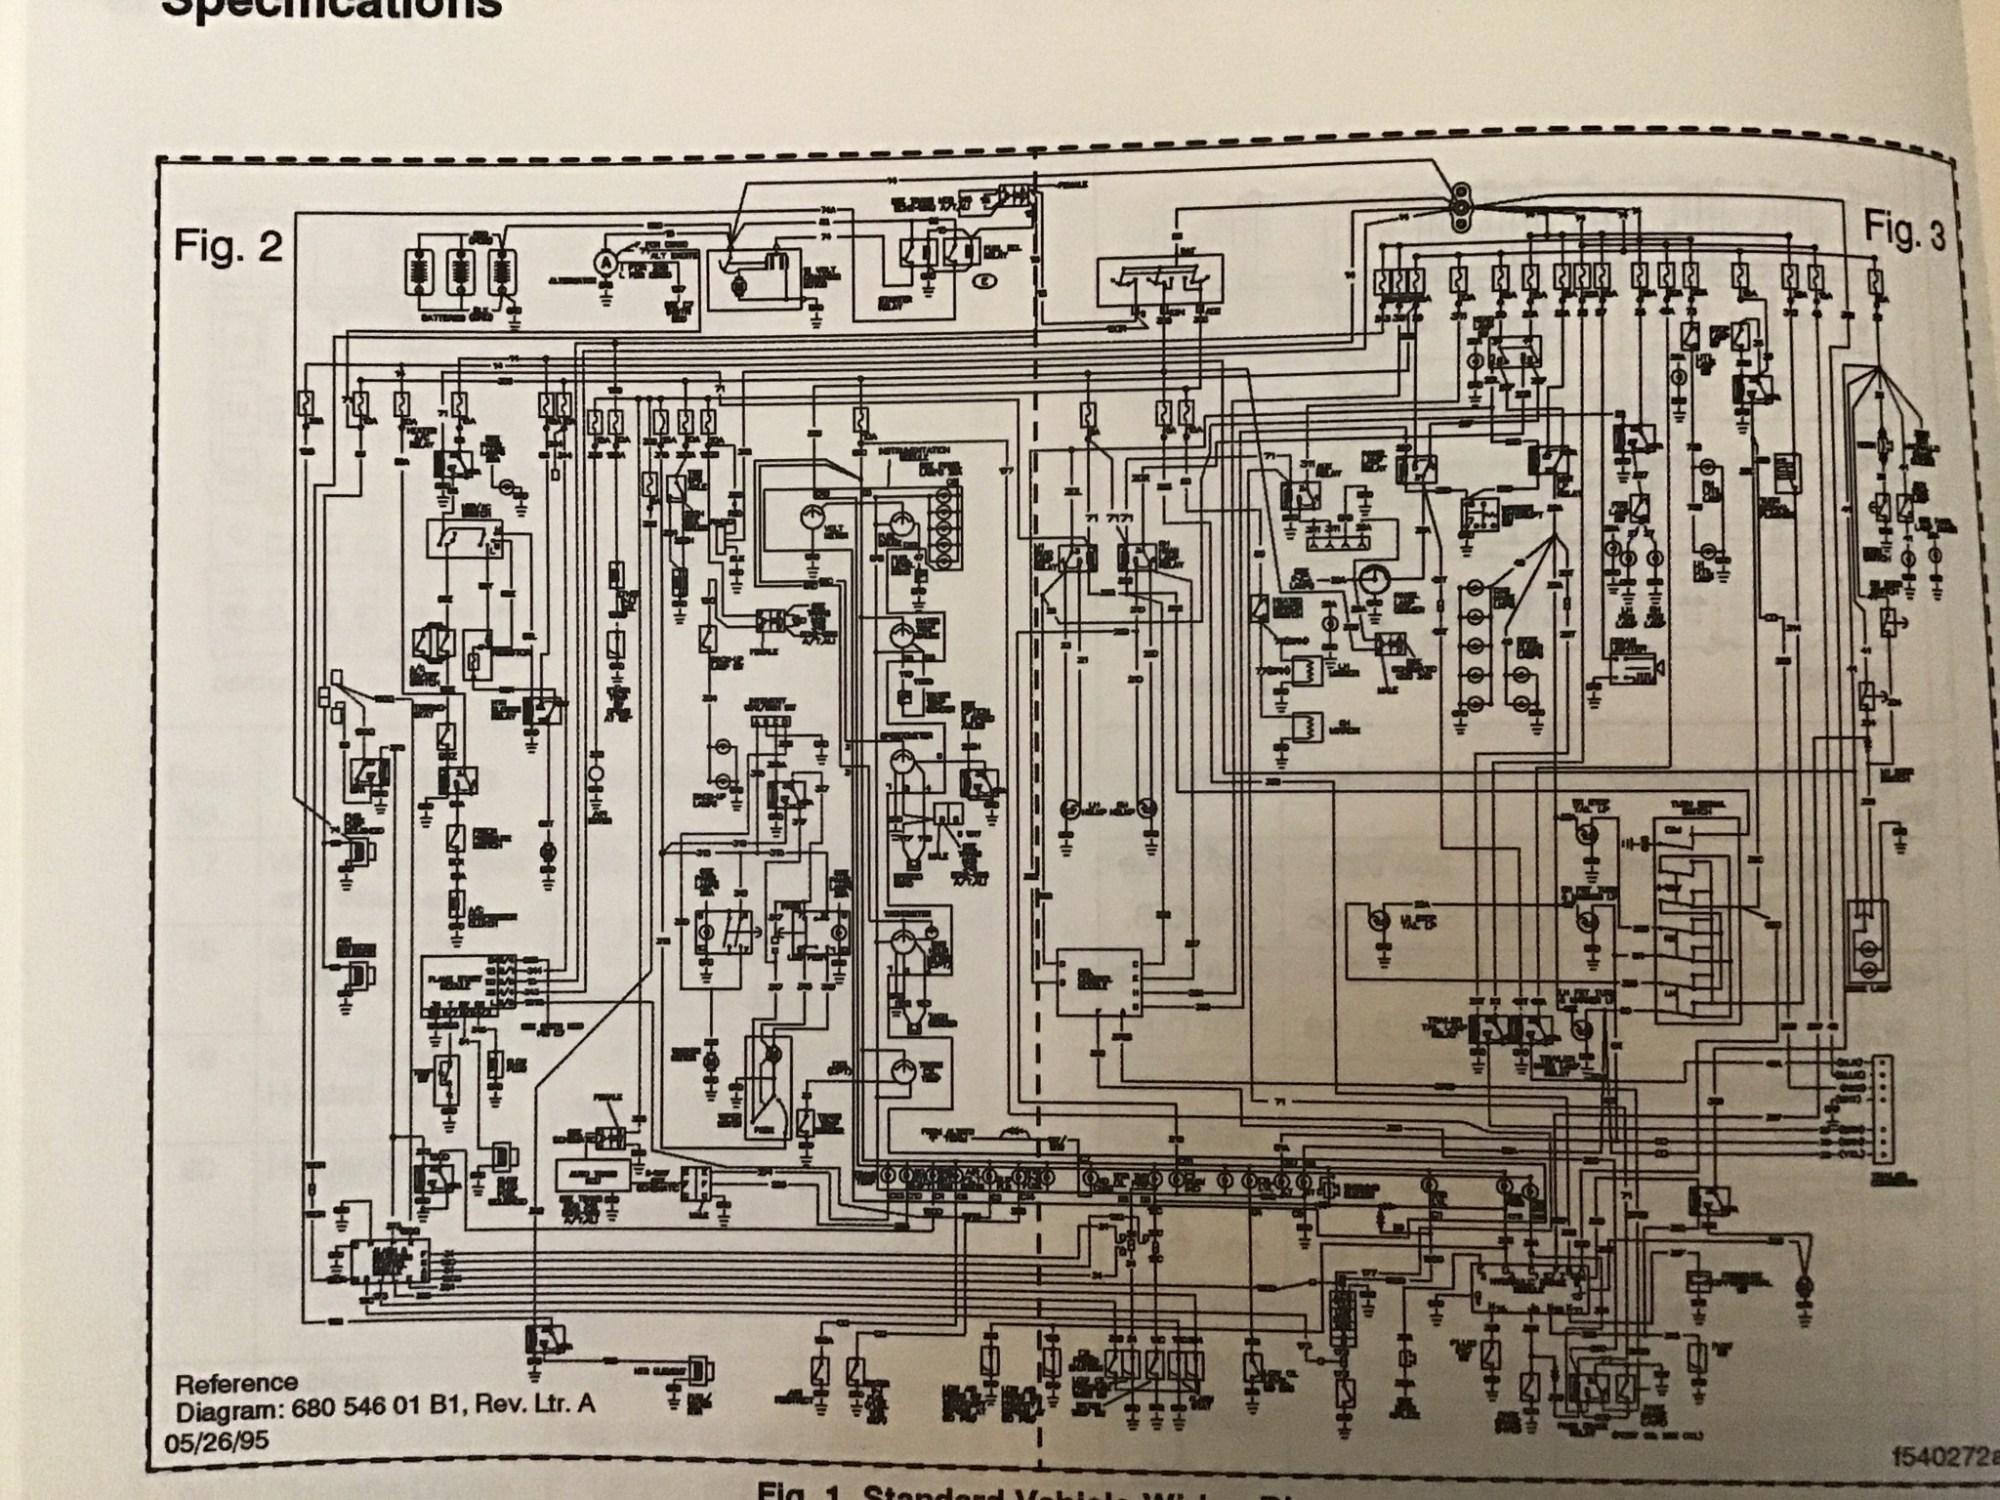 hight resolution of ambulance wiring diagram wiring diagram new leader ambulance wiring diagrams wiring diagrams konsult leader ambulance wiring